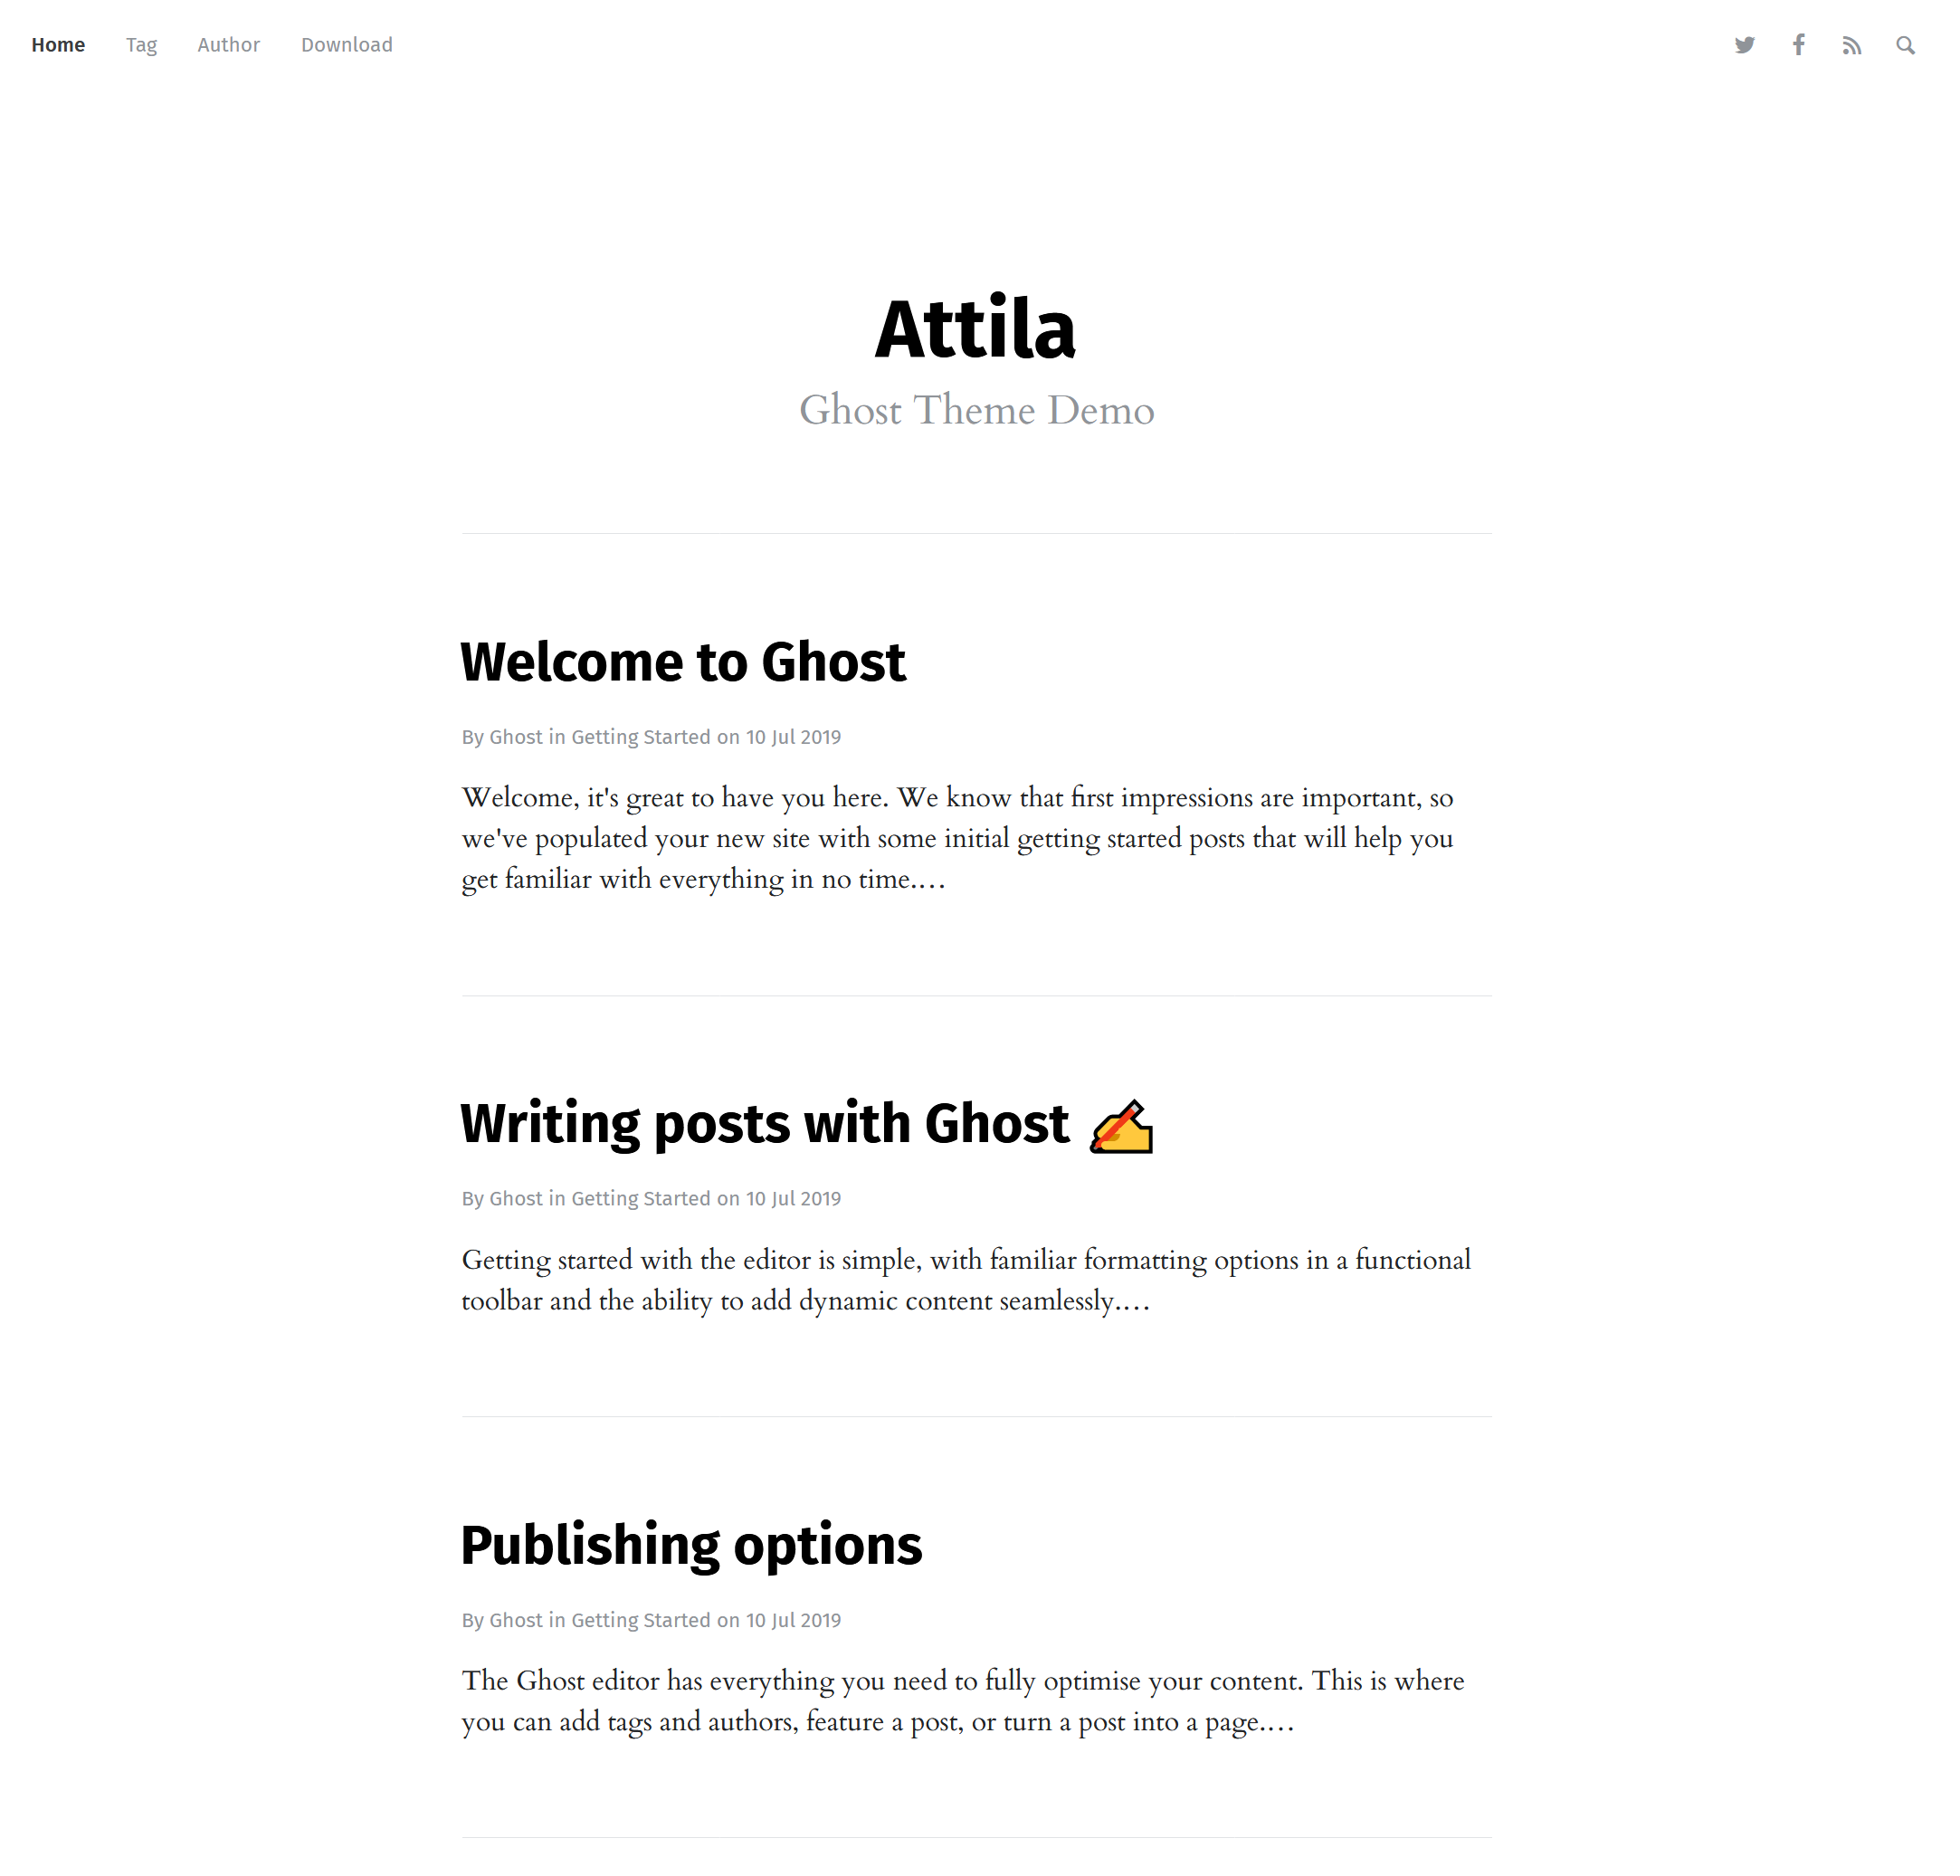 attila-ghost-theme